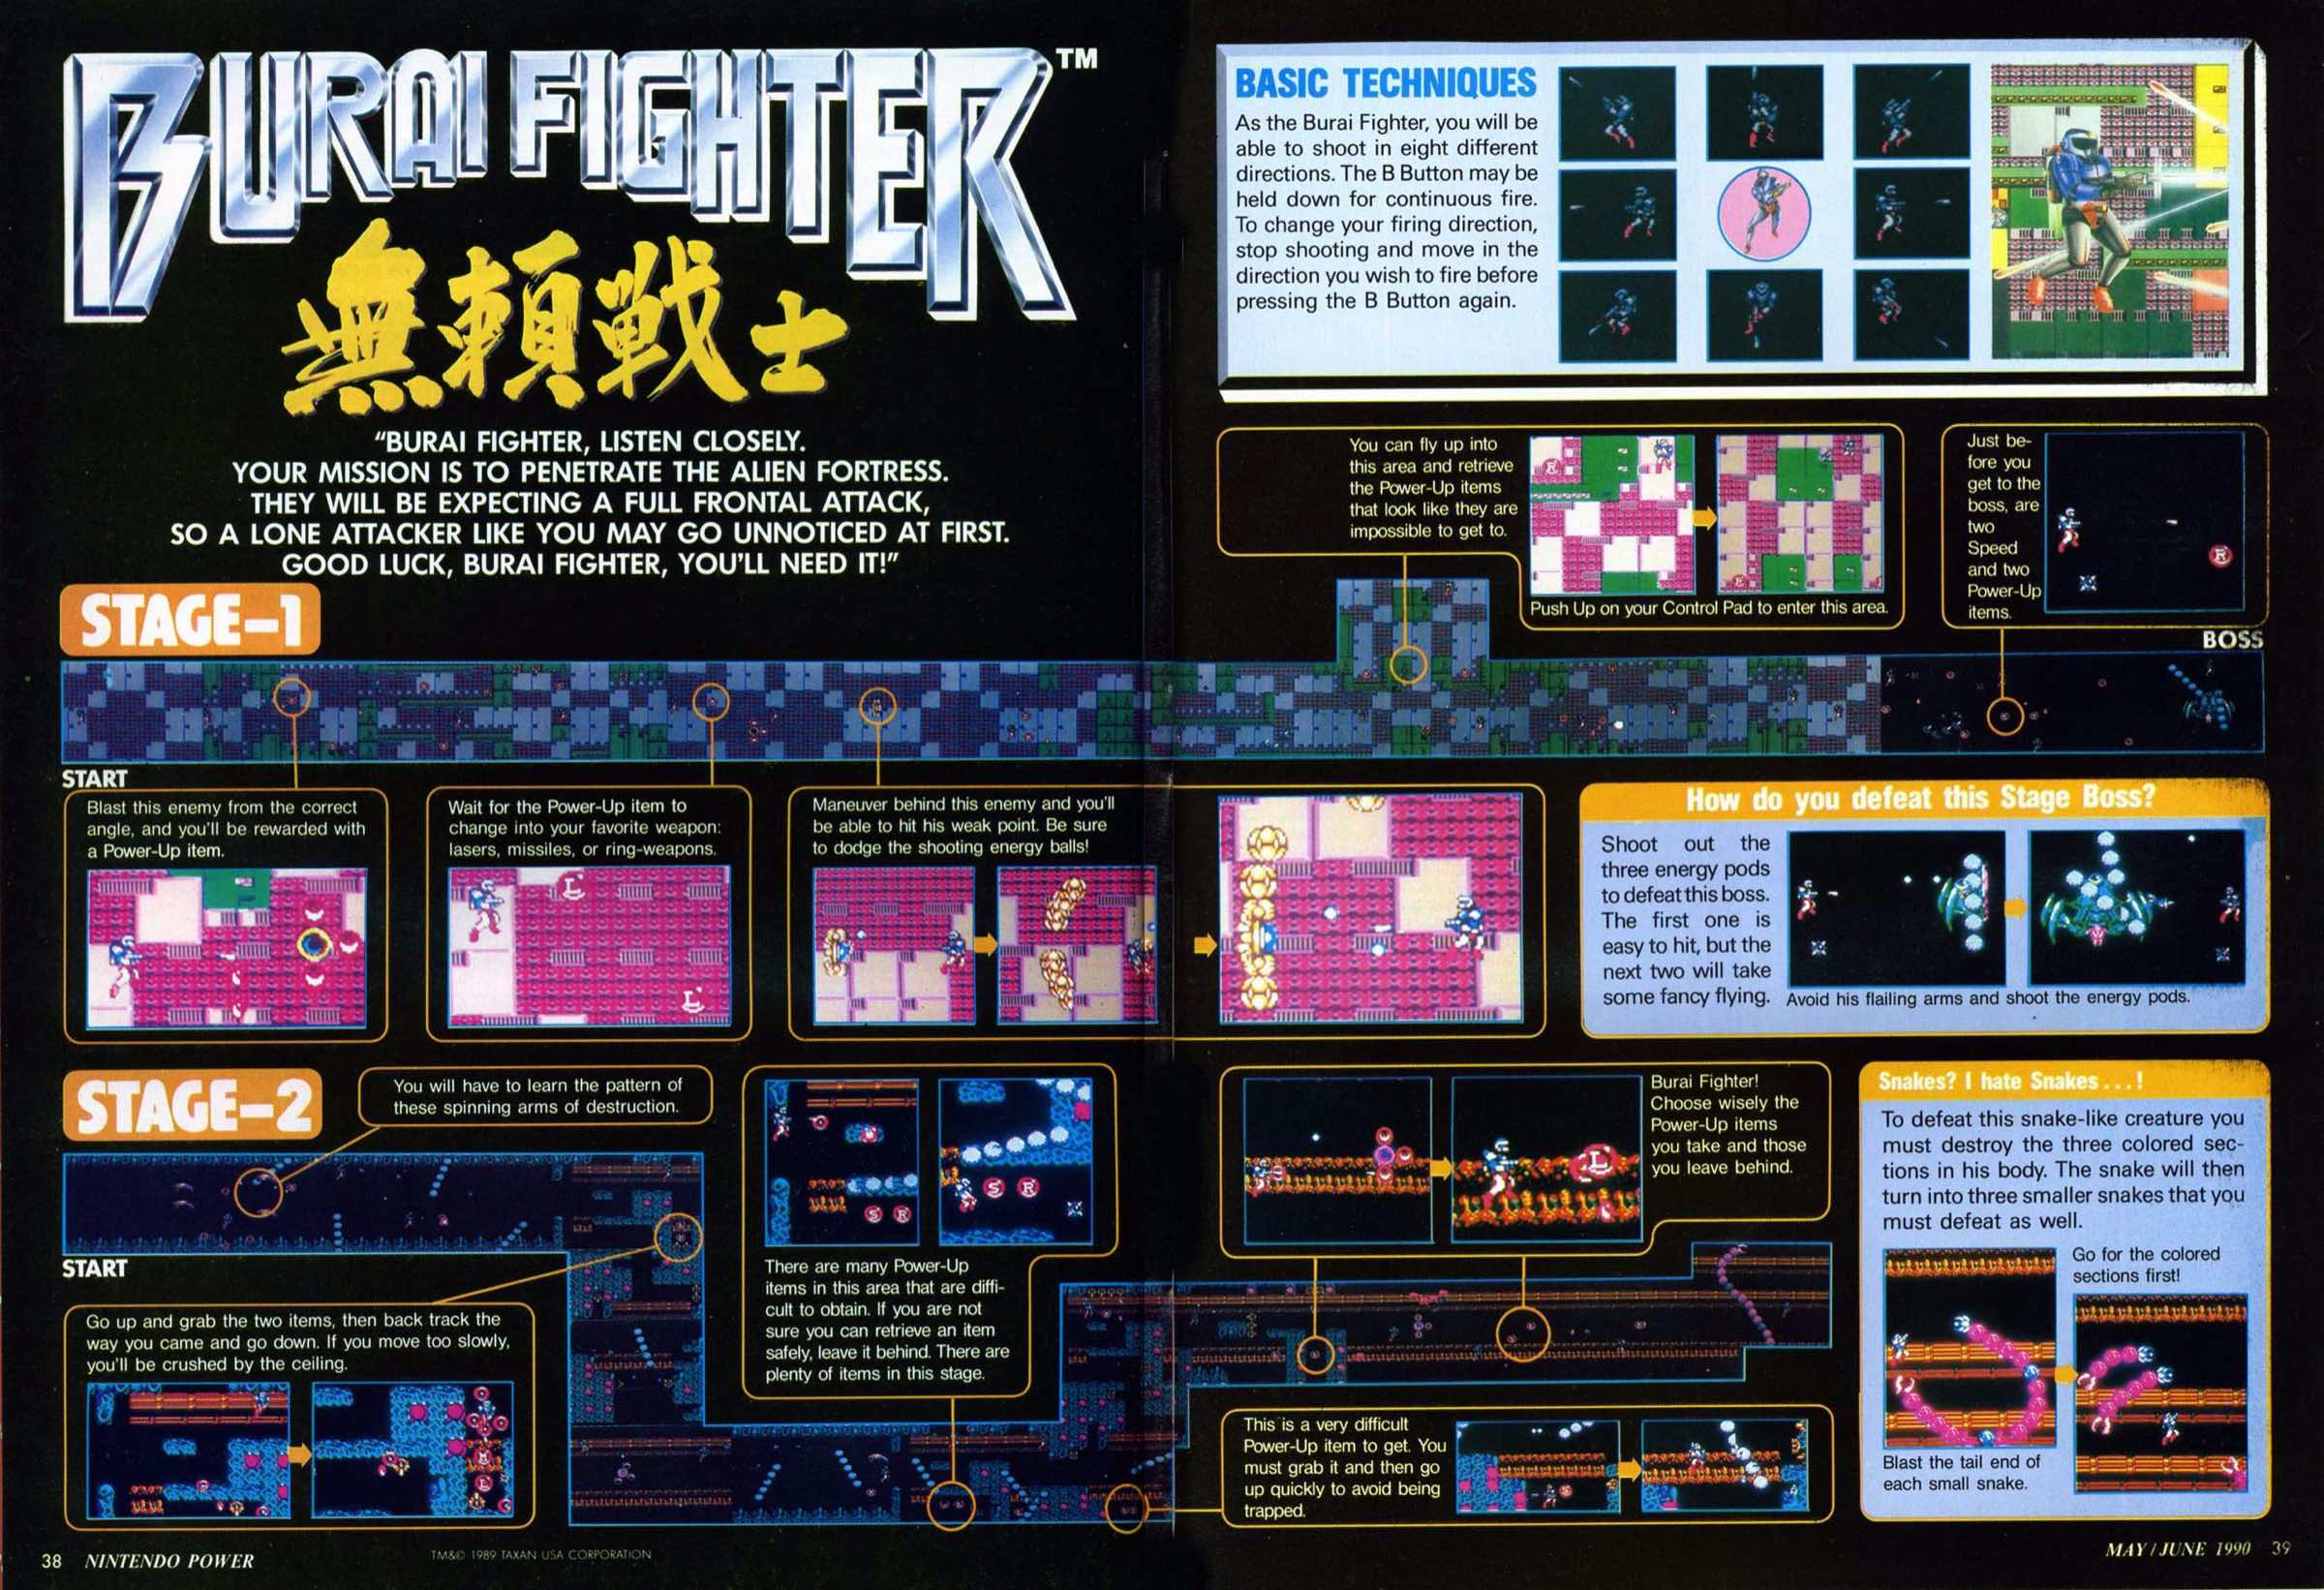 Nintendo Power | May June 1990 | p038-039